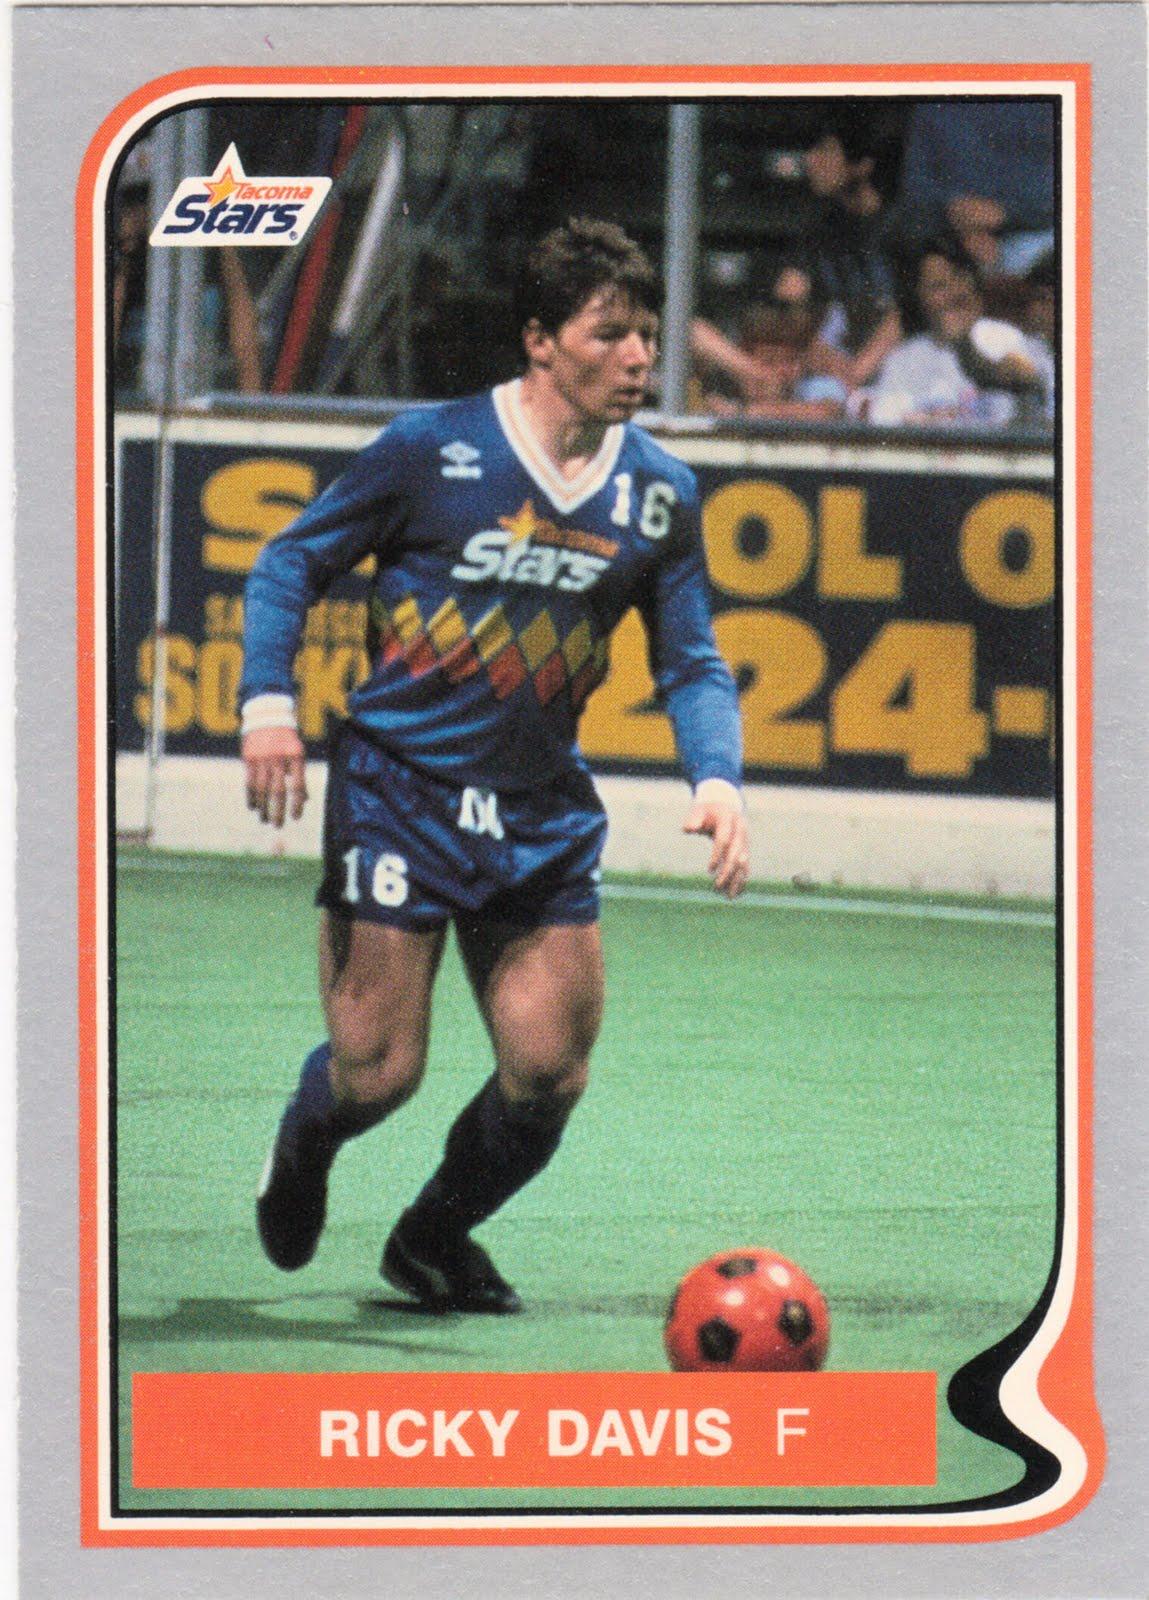 Ricky Davis 1987 MISL card.jpg